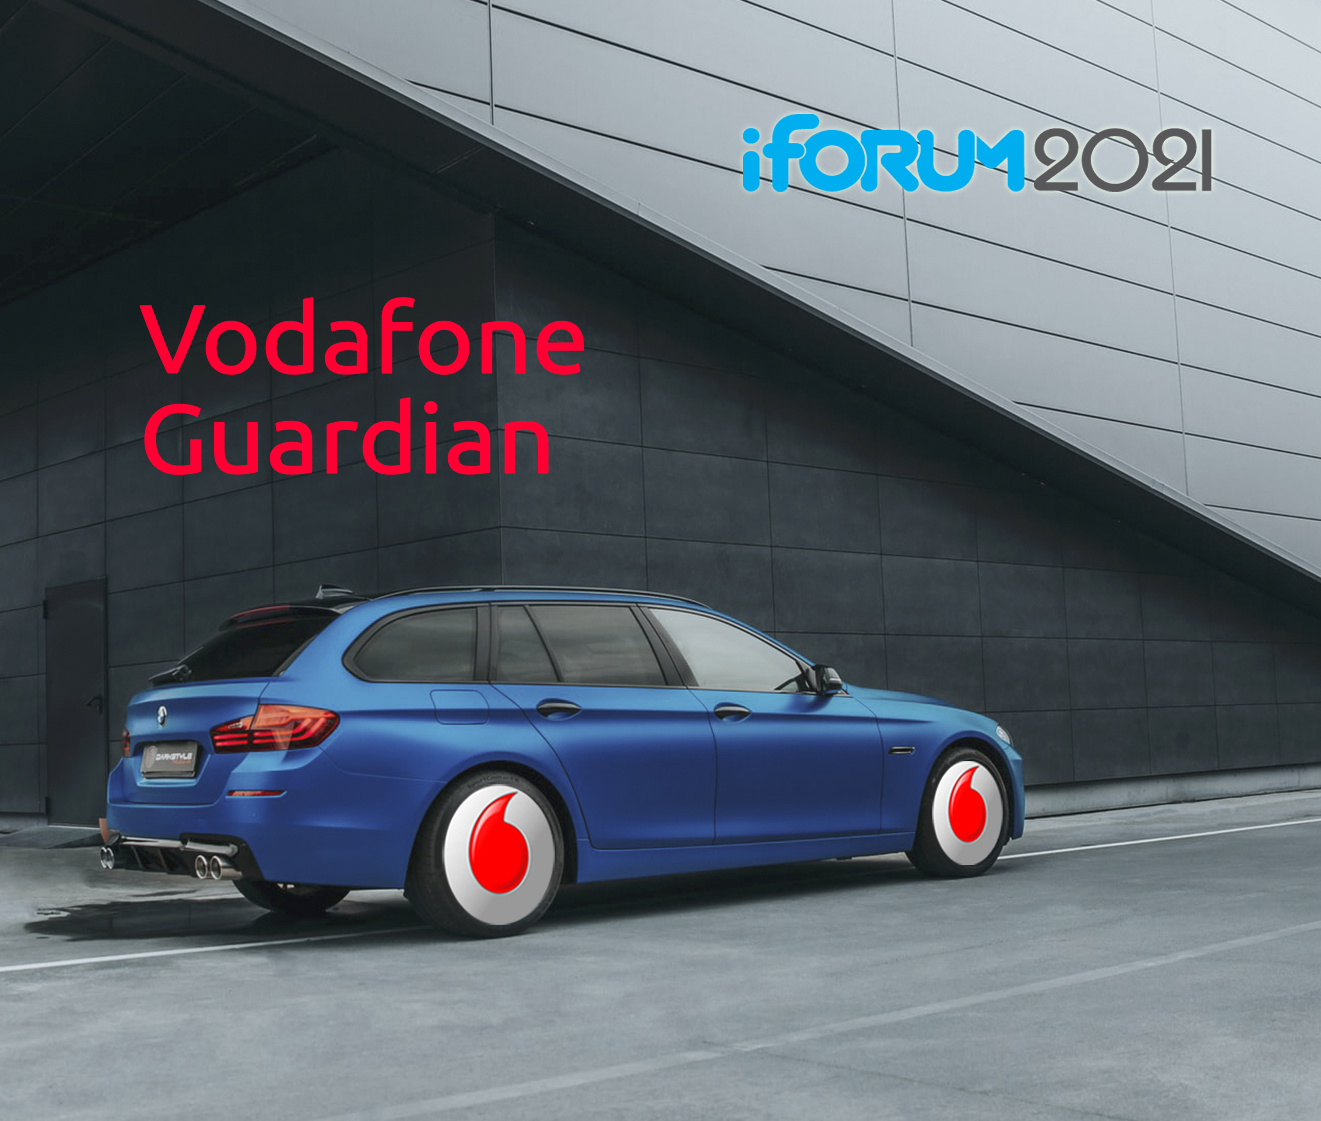 Vodafone Guardian буде представлено на iForum 2021